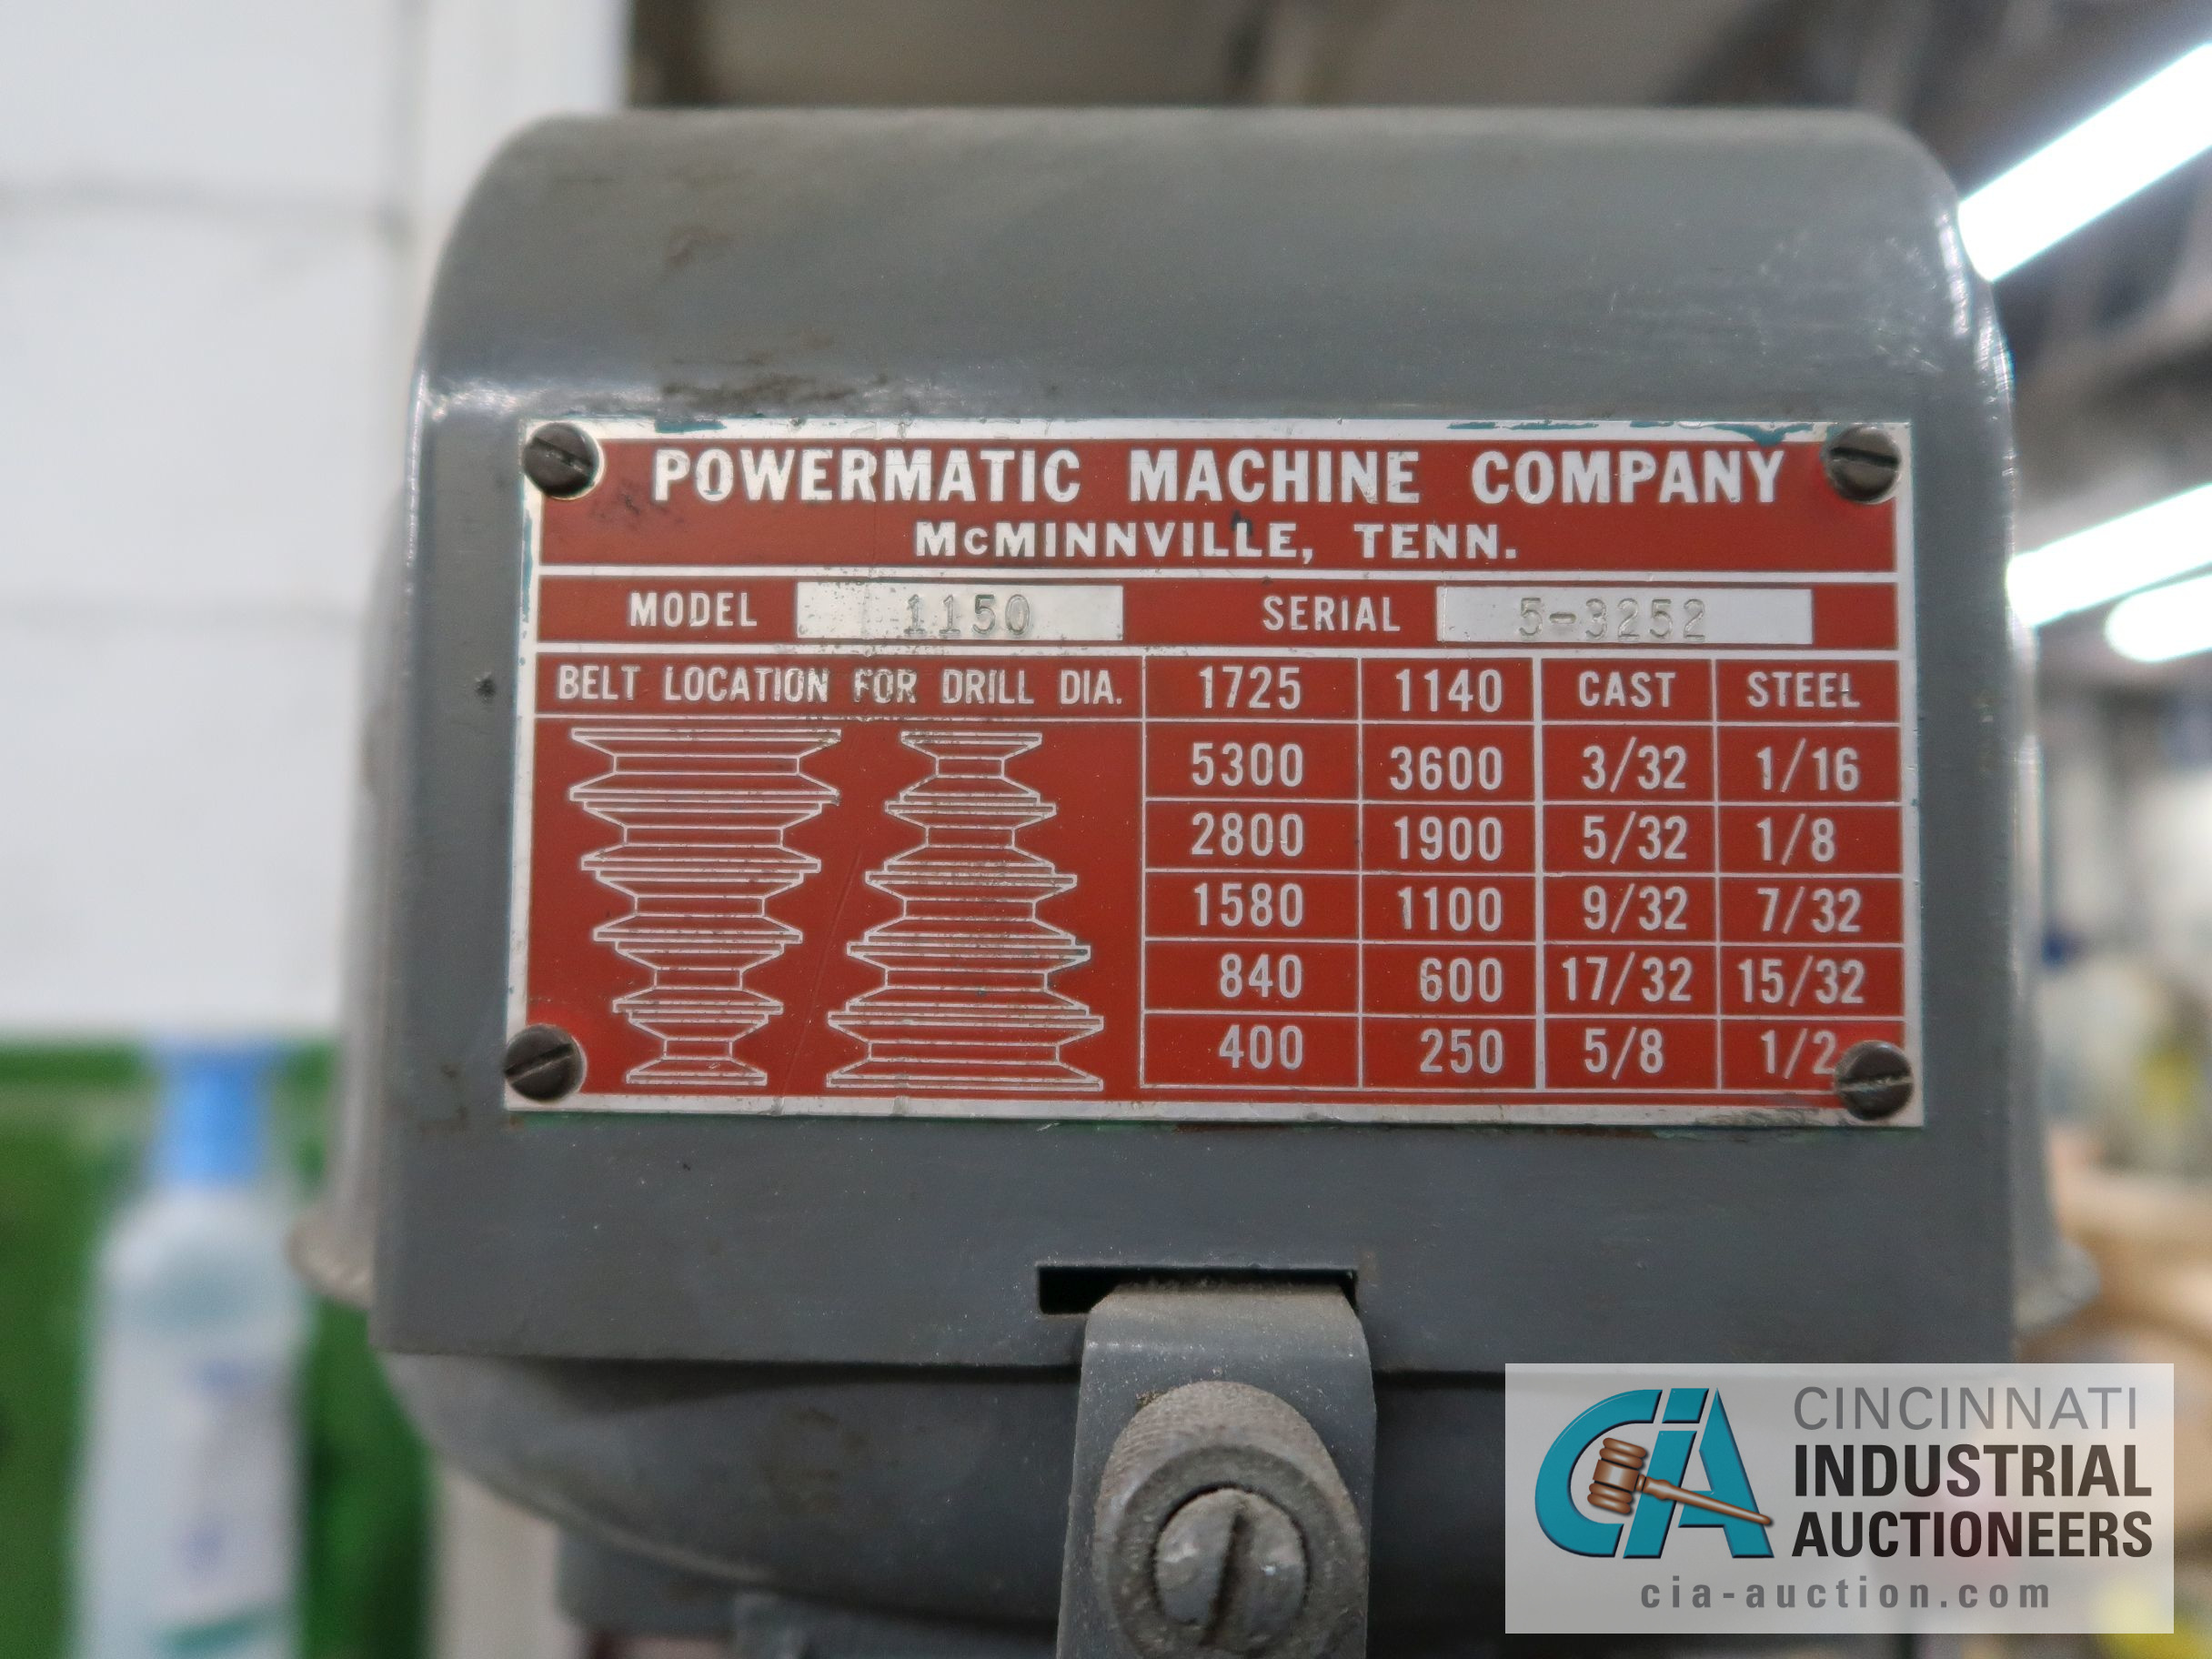 POWERMATIC MODEL 1150 12-SPEED DRILL PRESS; S/N 5-3252 - Image 4 of 4